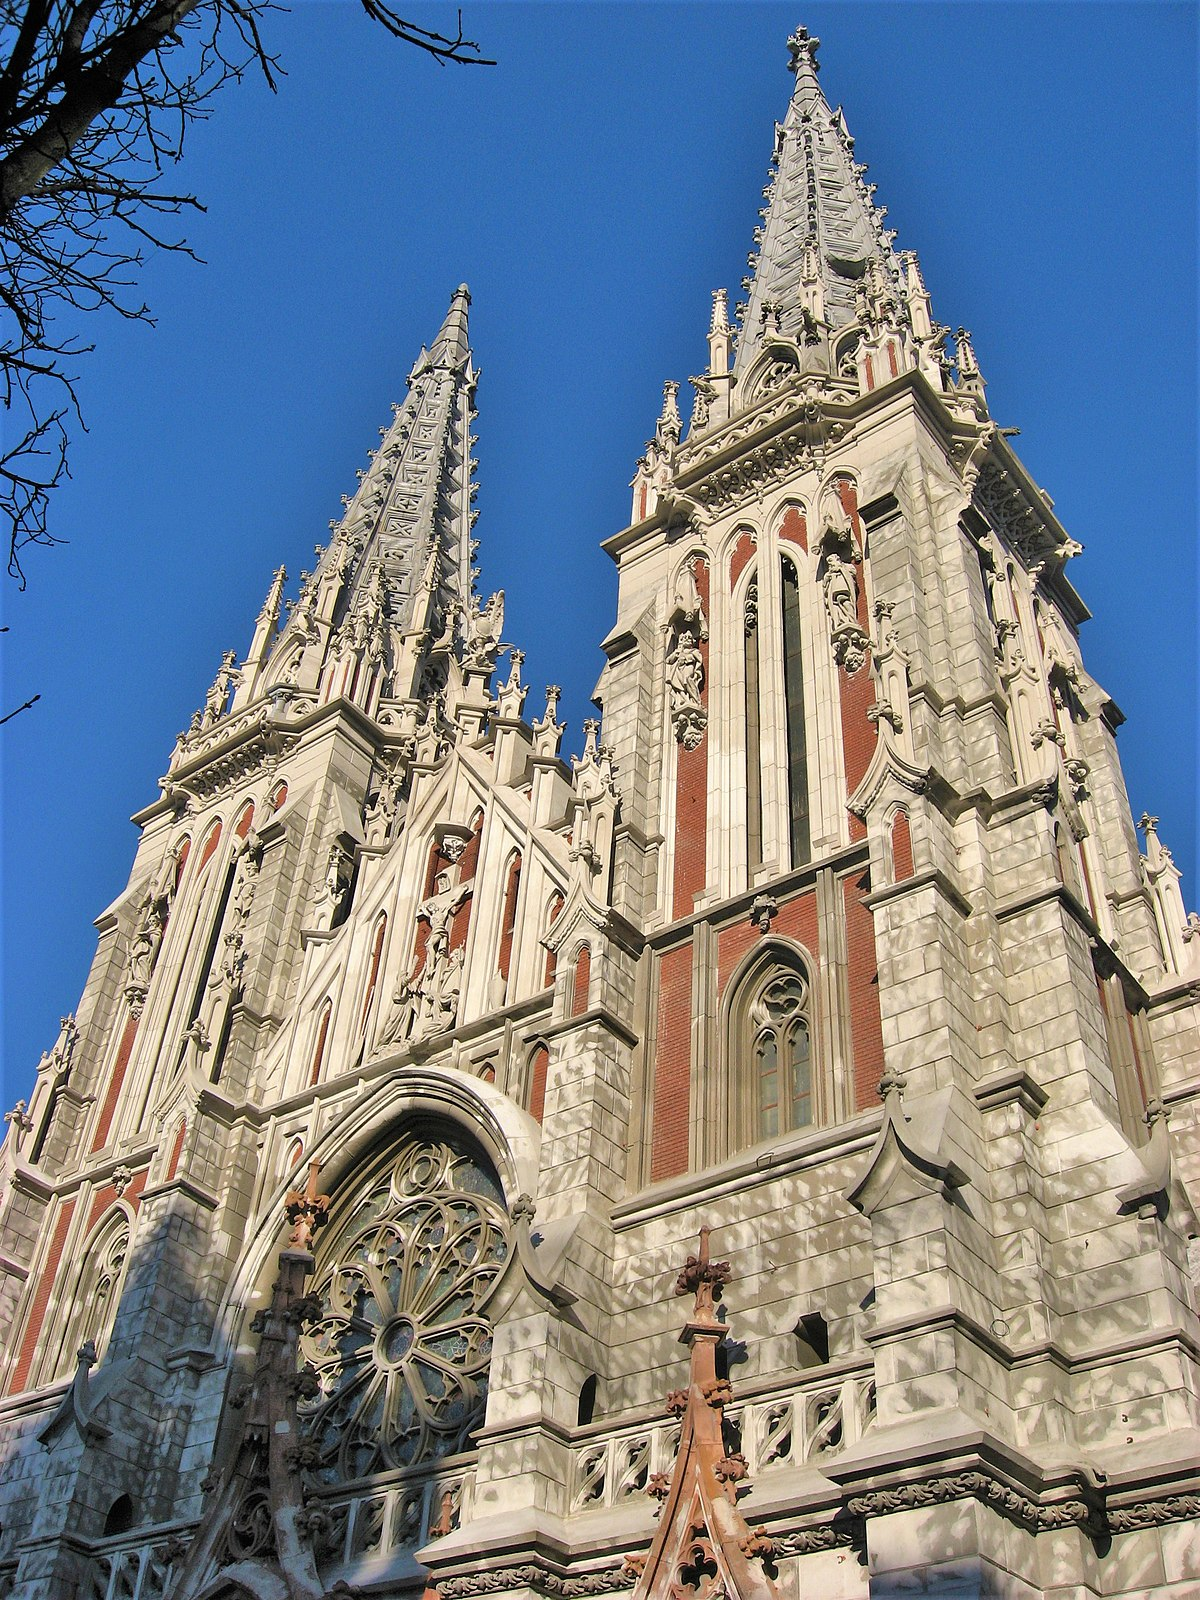 st nicholas cathedral kiev catholic ukraine church roman file wikipedia commons churches catholicism kyiv wikimedia architecture sv history katedra gothic